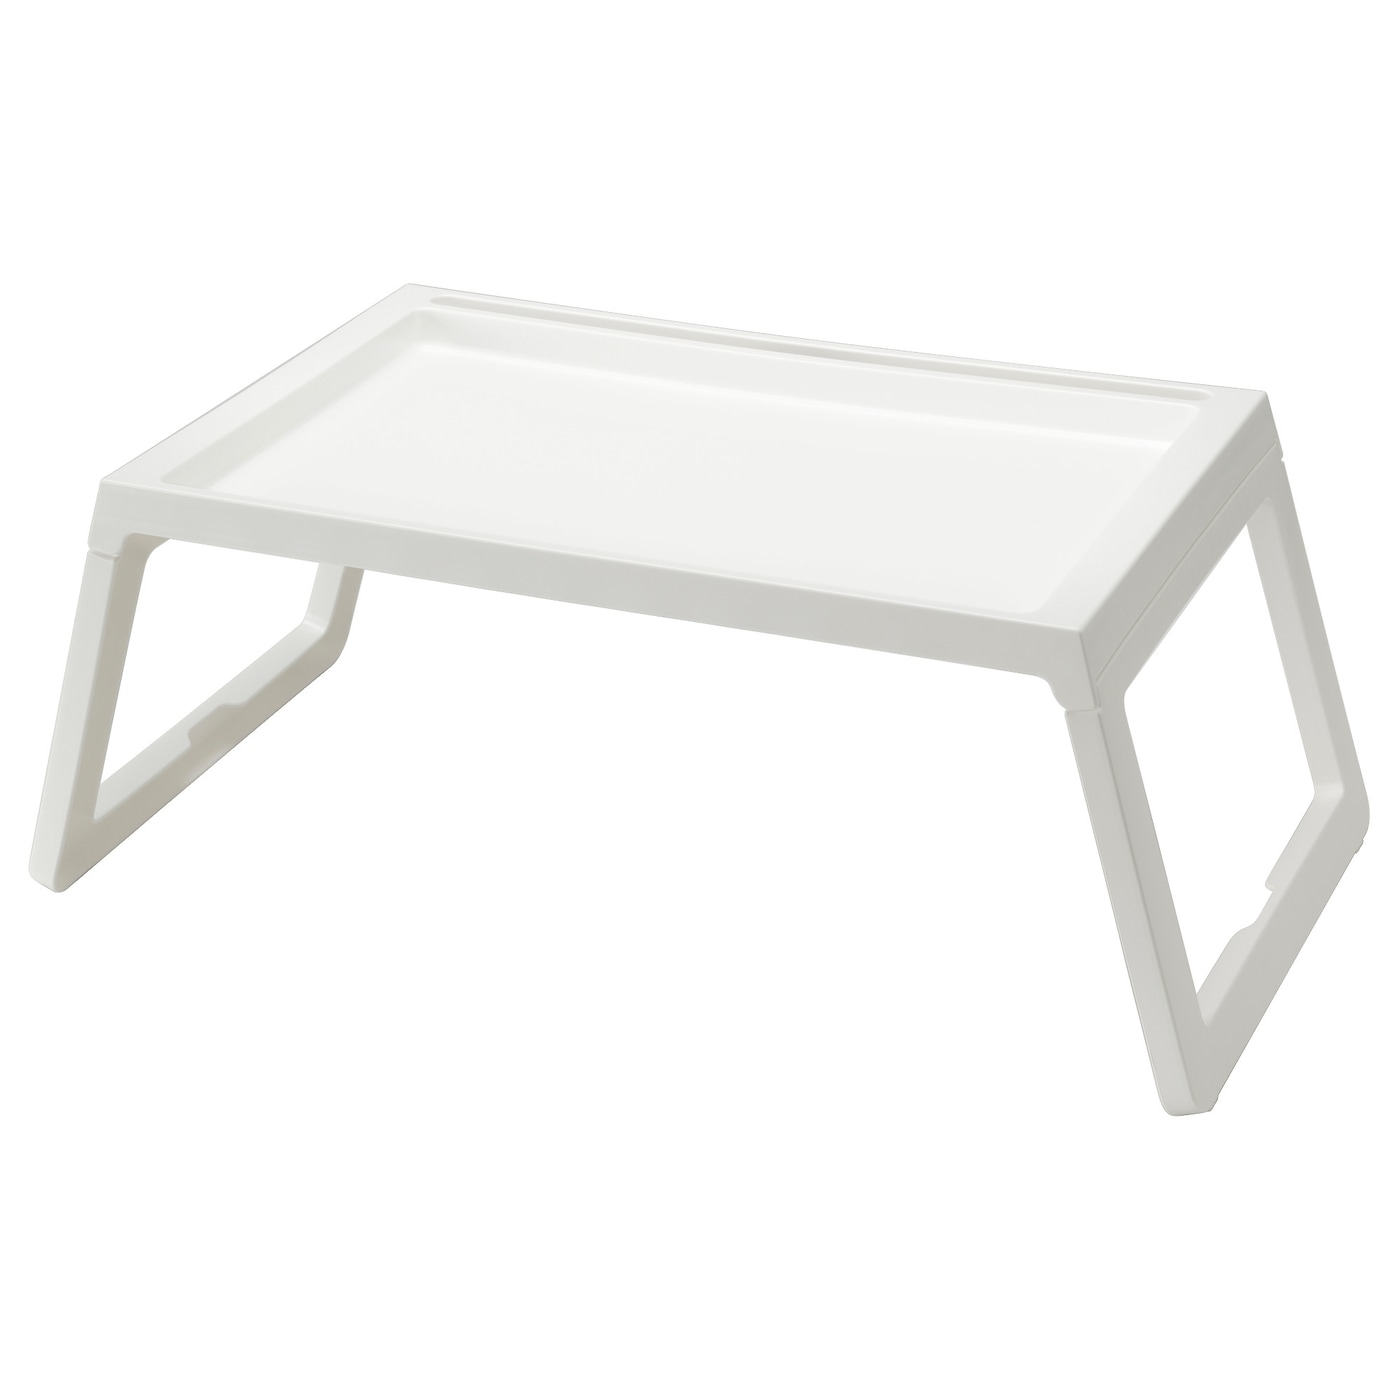 Tavolino Che Diventa Tavolo Ikea klipsk vassoio da letto - bianco